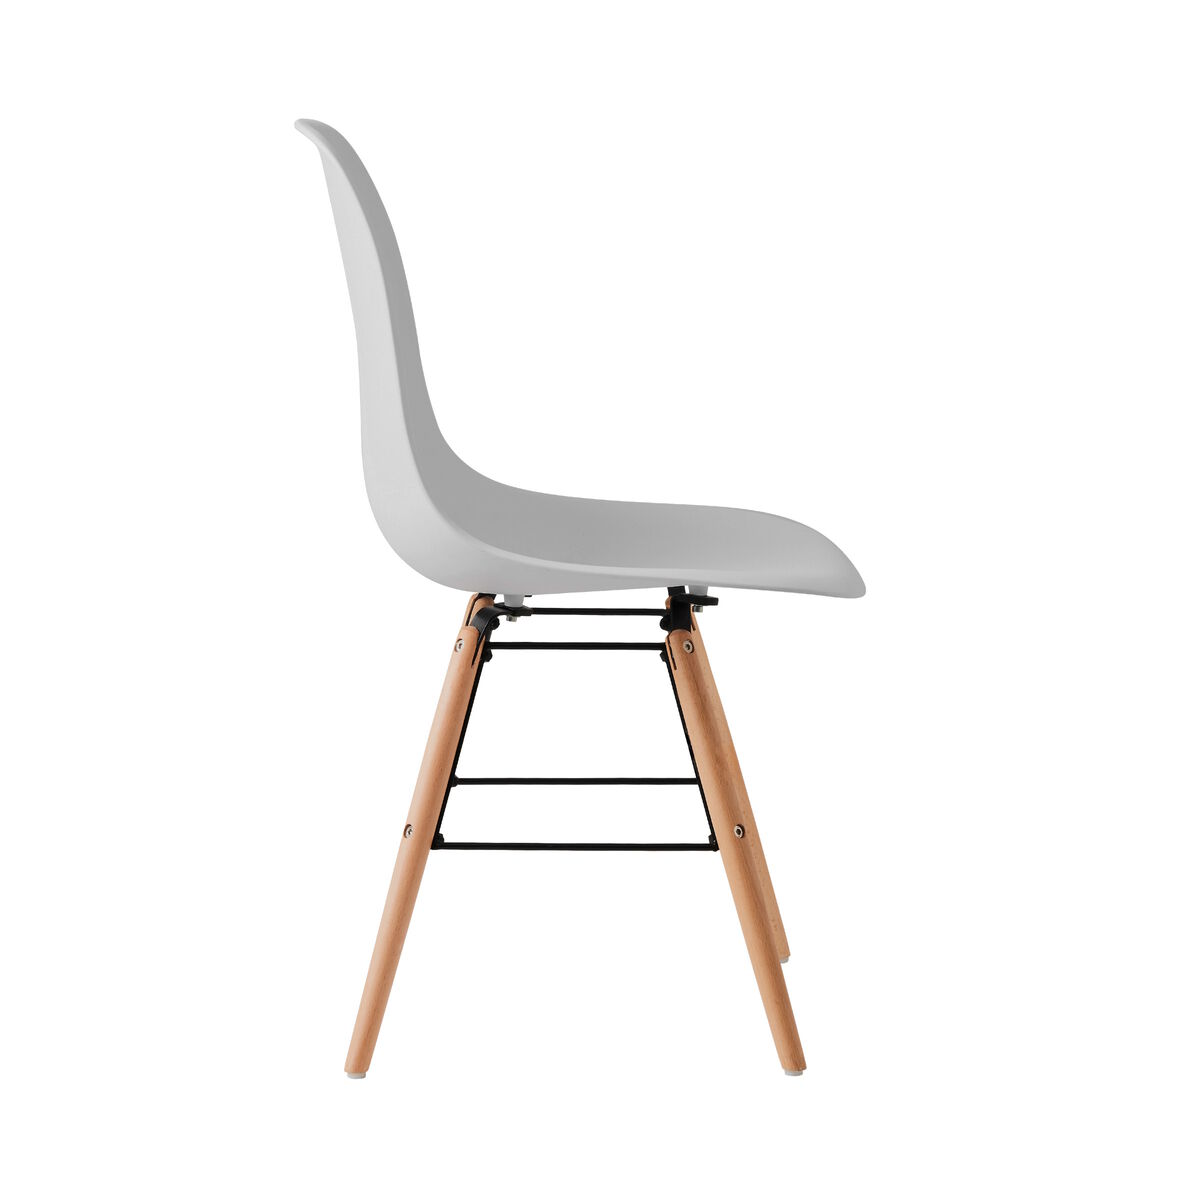 SEAT-OF-THE-ART Stuhl, grau